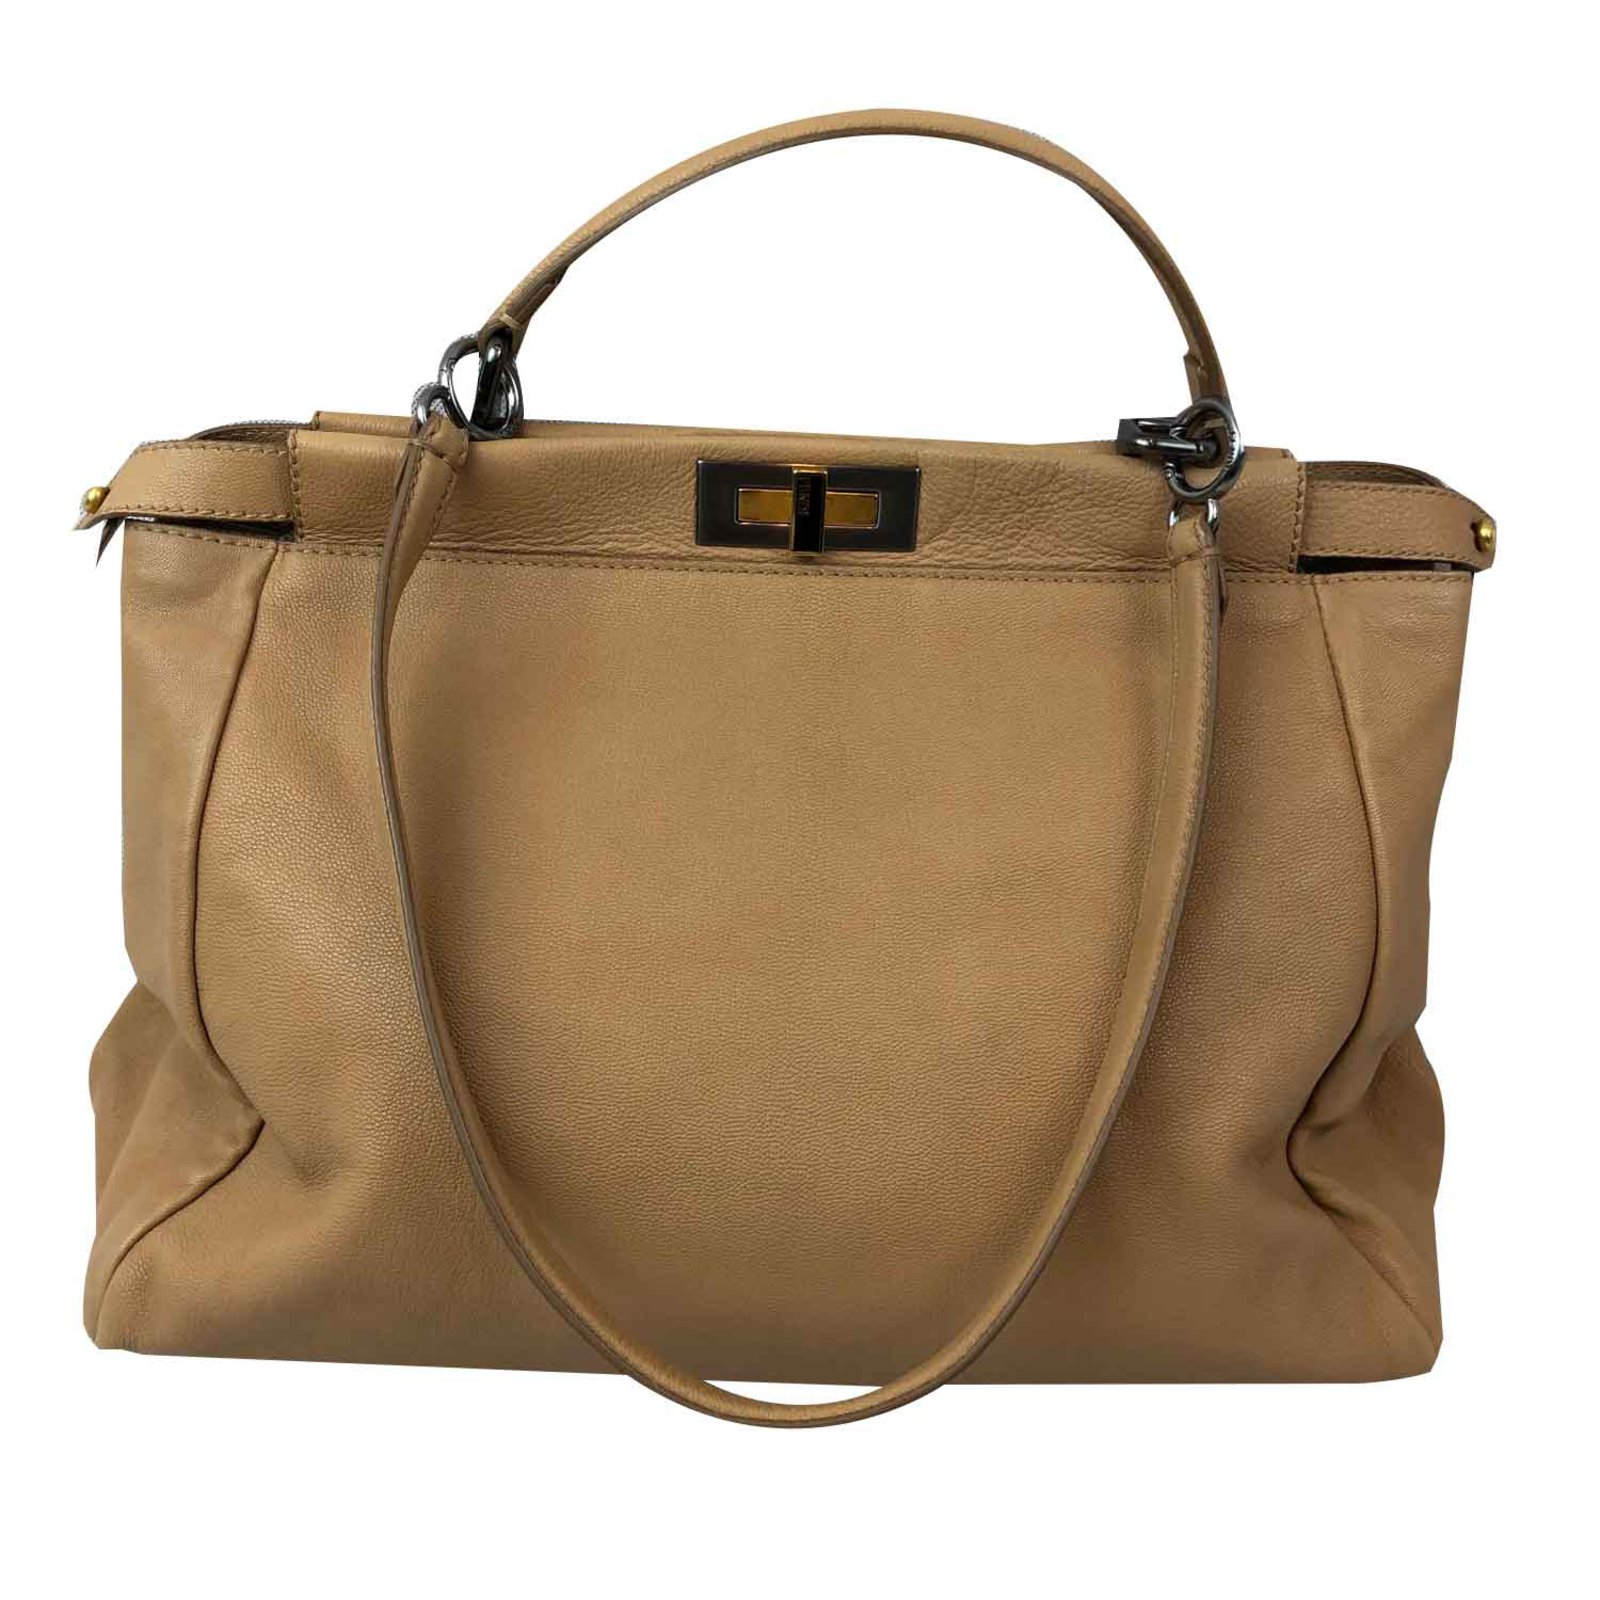 62a1378caeec Fendi PEEKABOO Handbags Leather Beige ref.108892 - Joli Closet